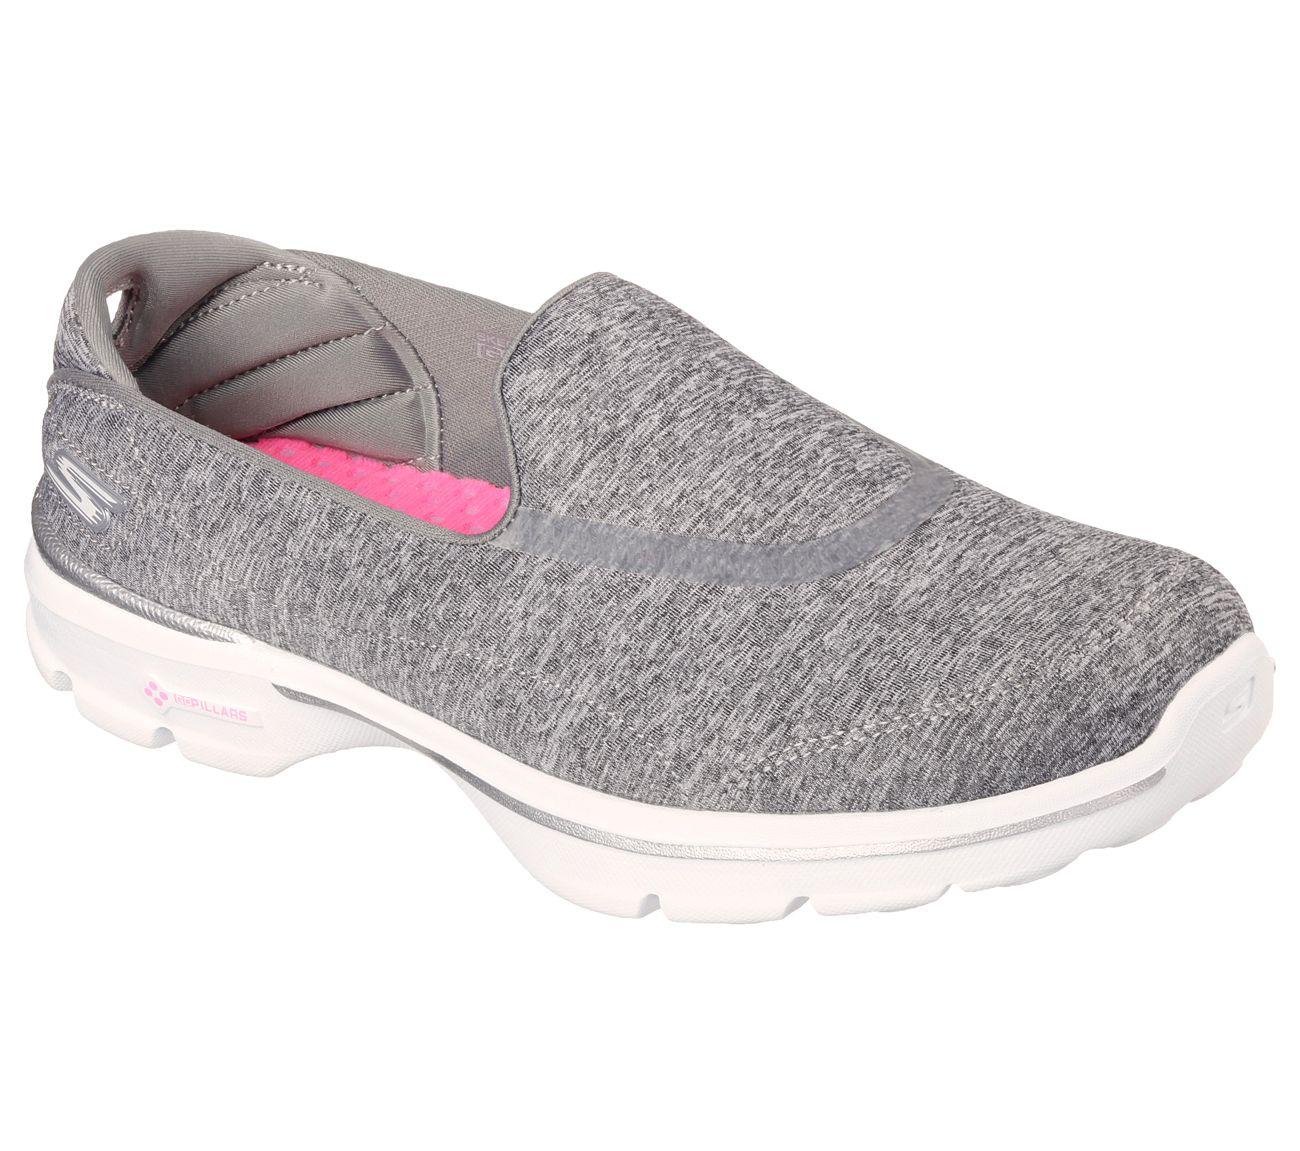 Gowalk 3 Reboot Skechers Women Comfortable Walking Shoes